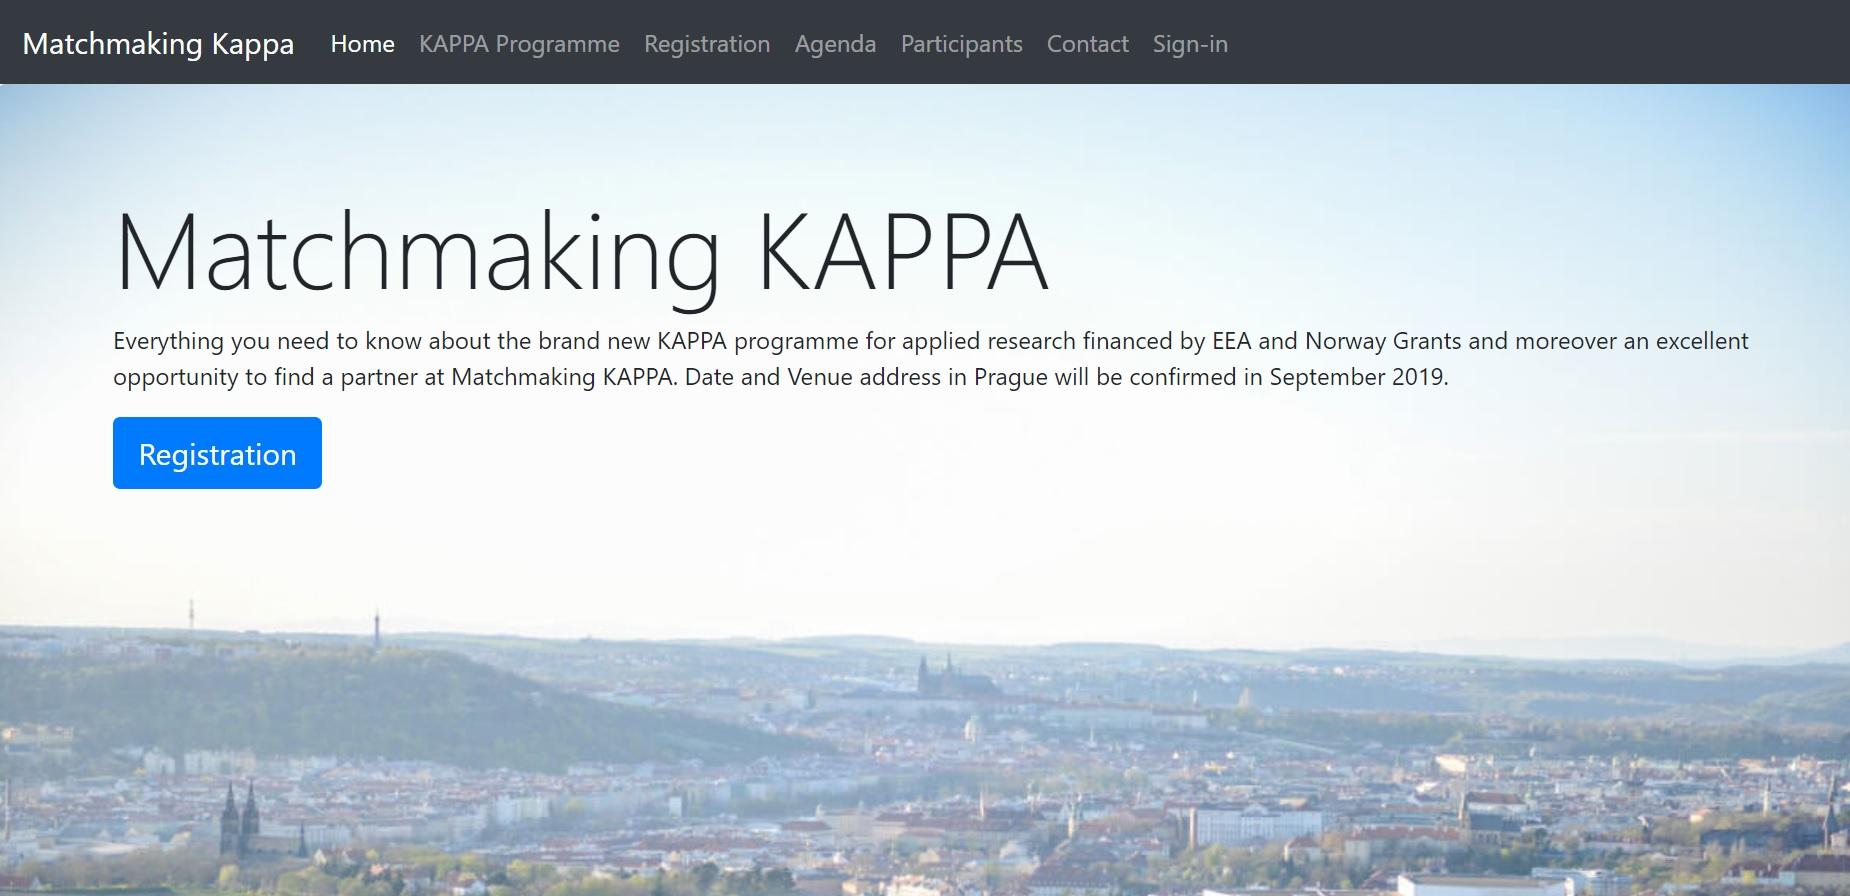 matchmaking kappa app